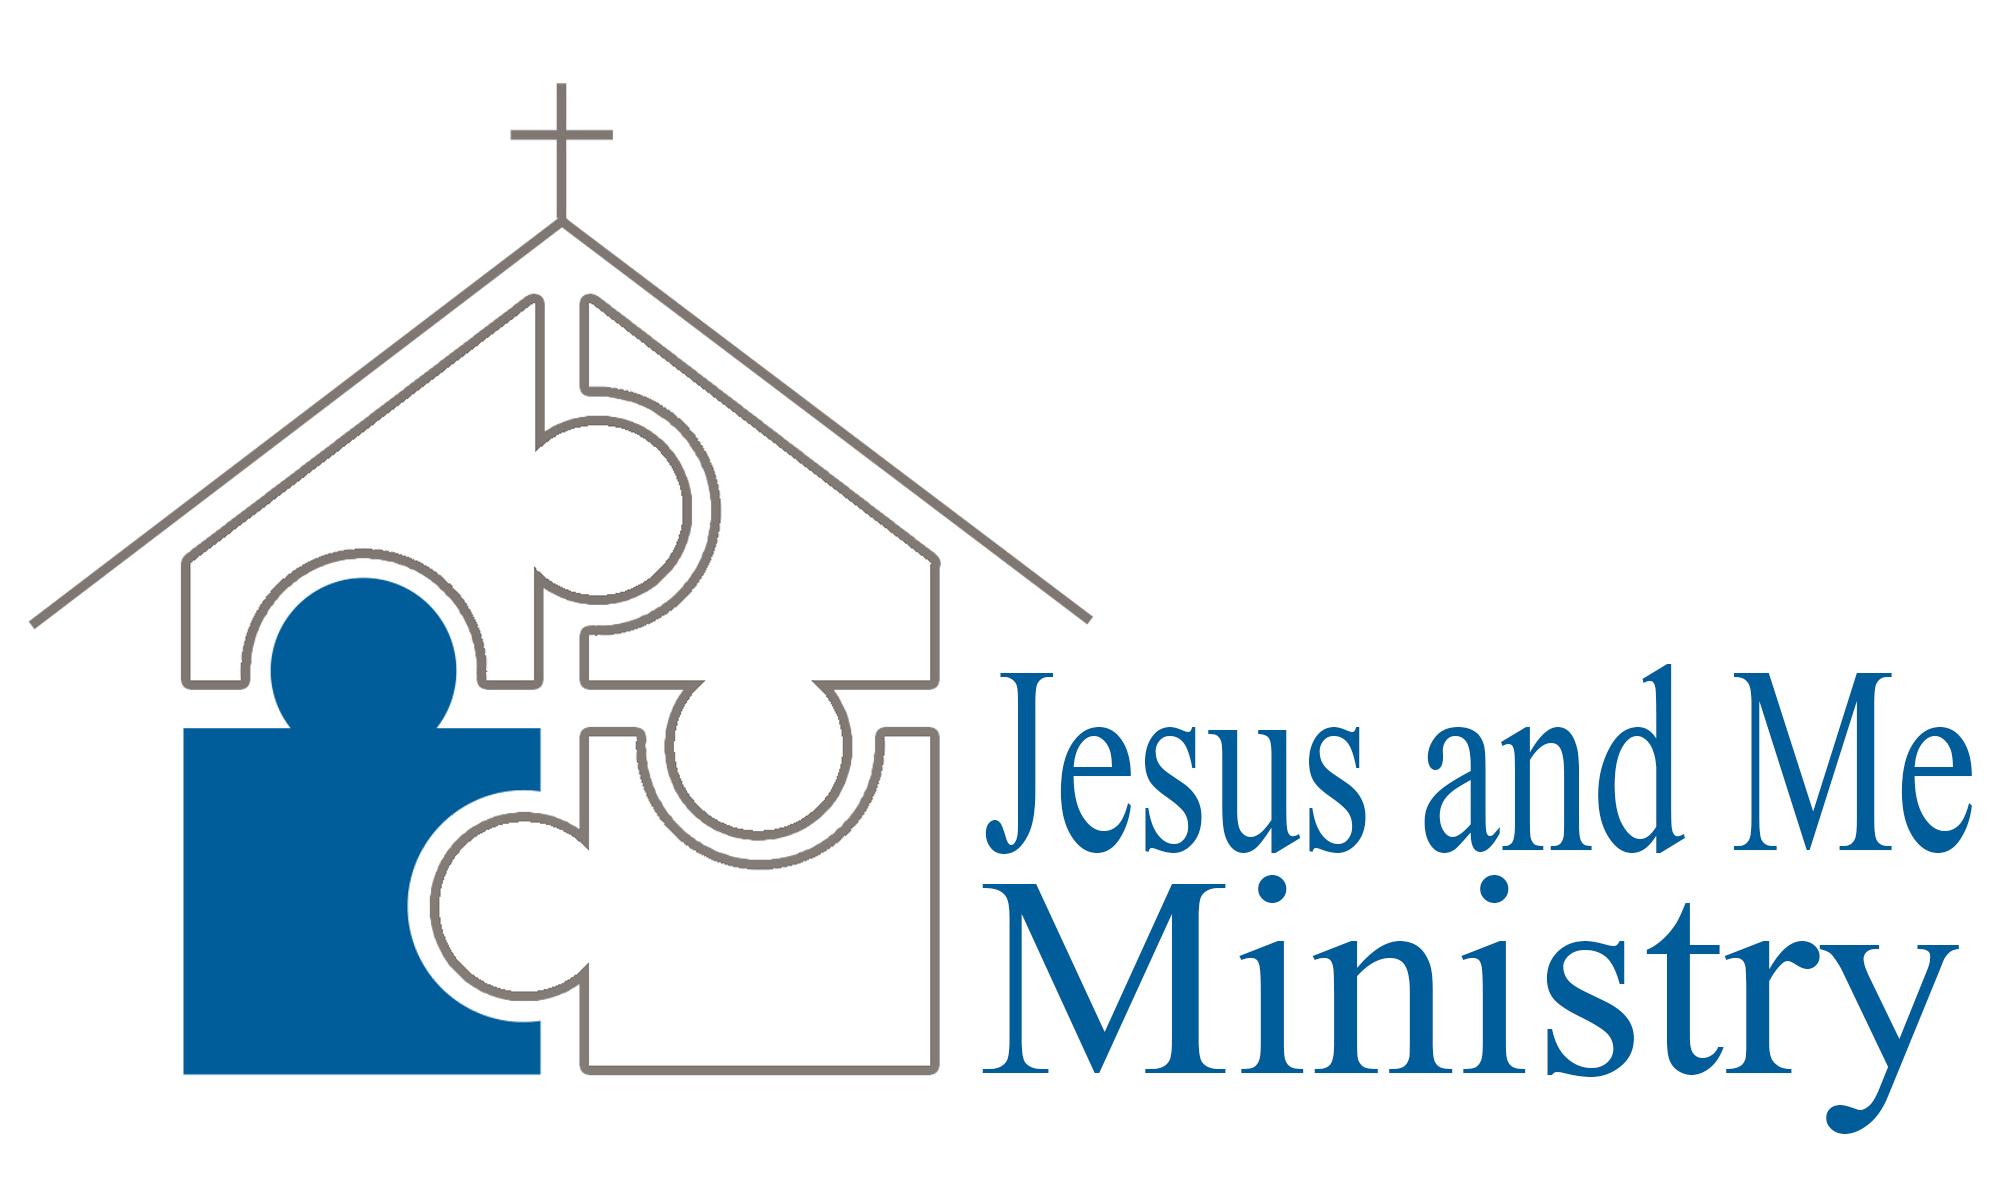 Jesus and Me Ministry.jpg